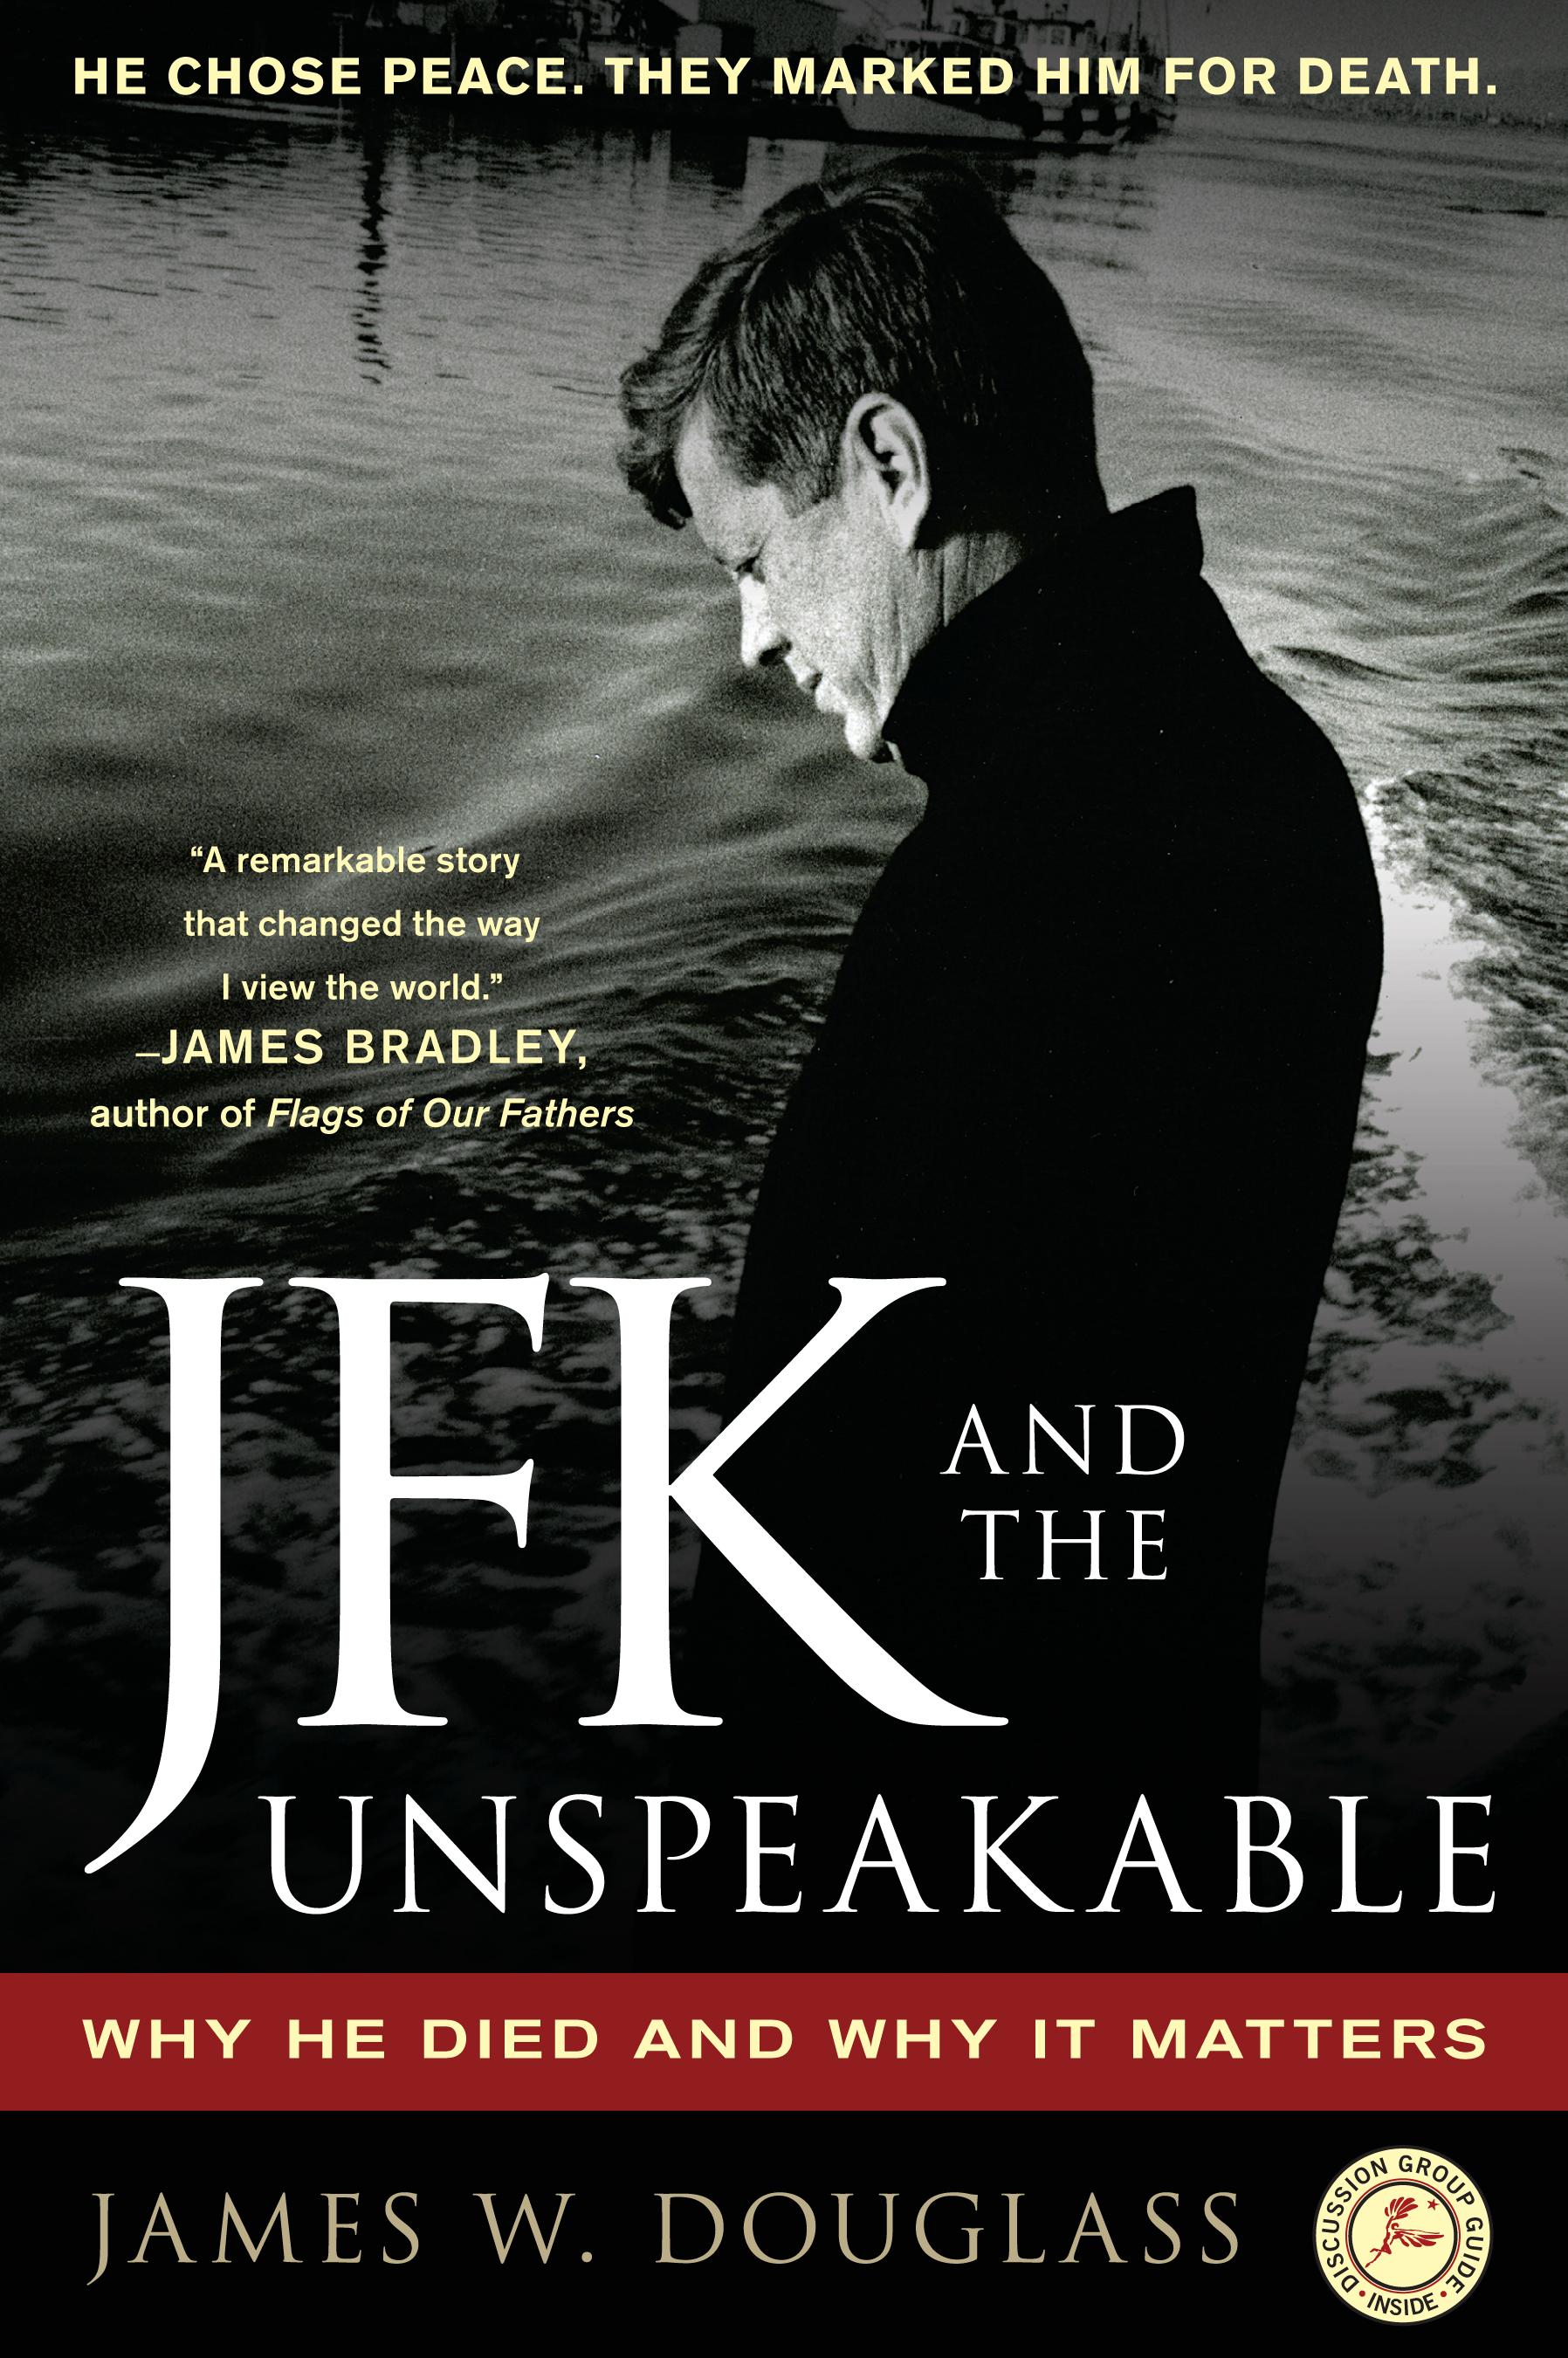 fifty jfk conspiracy clues essay